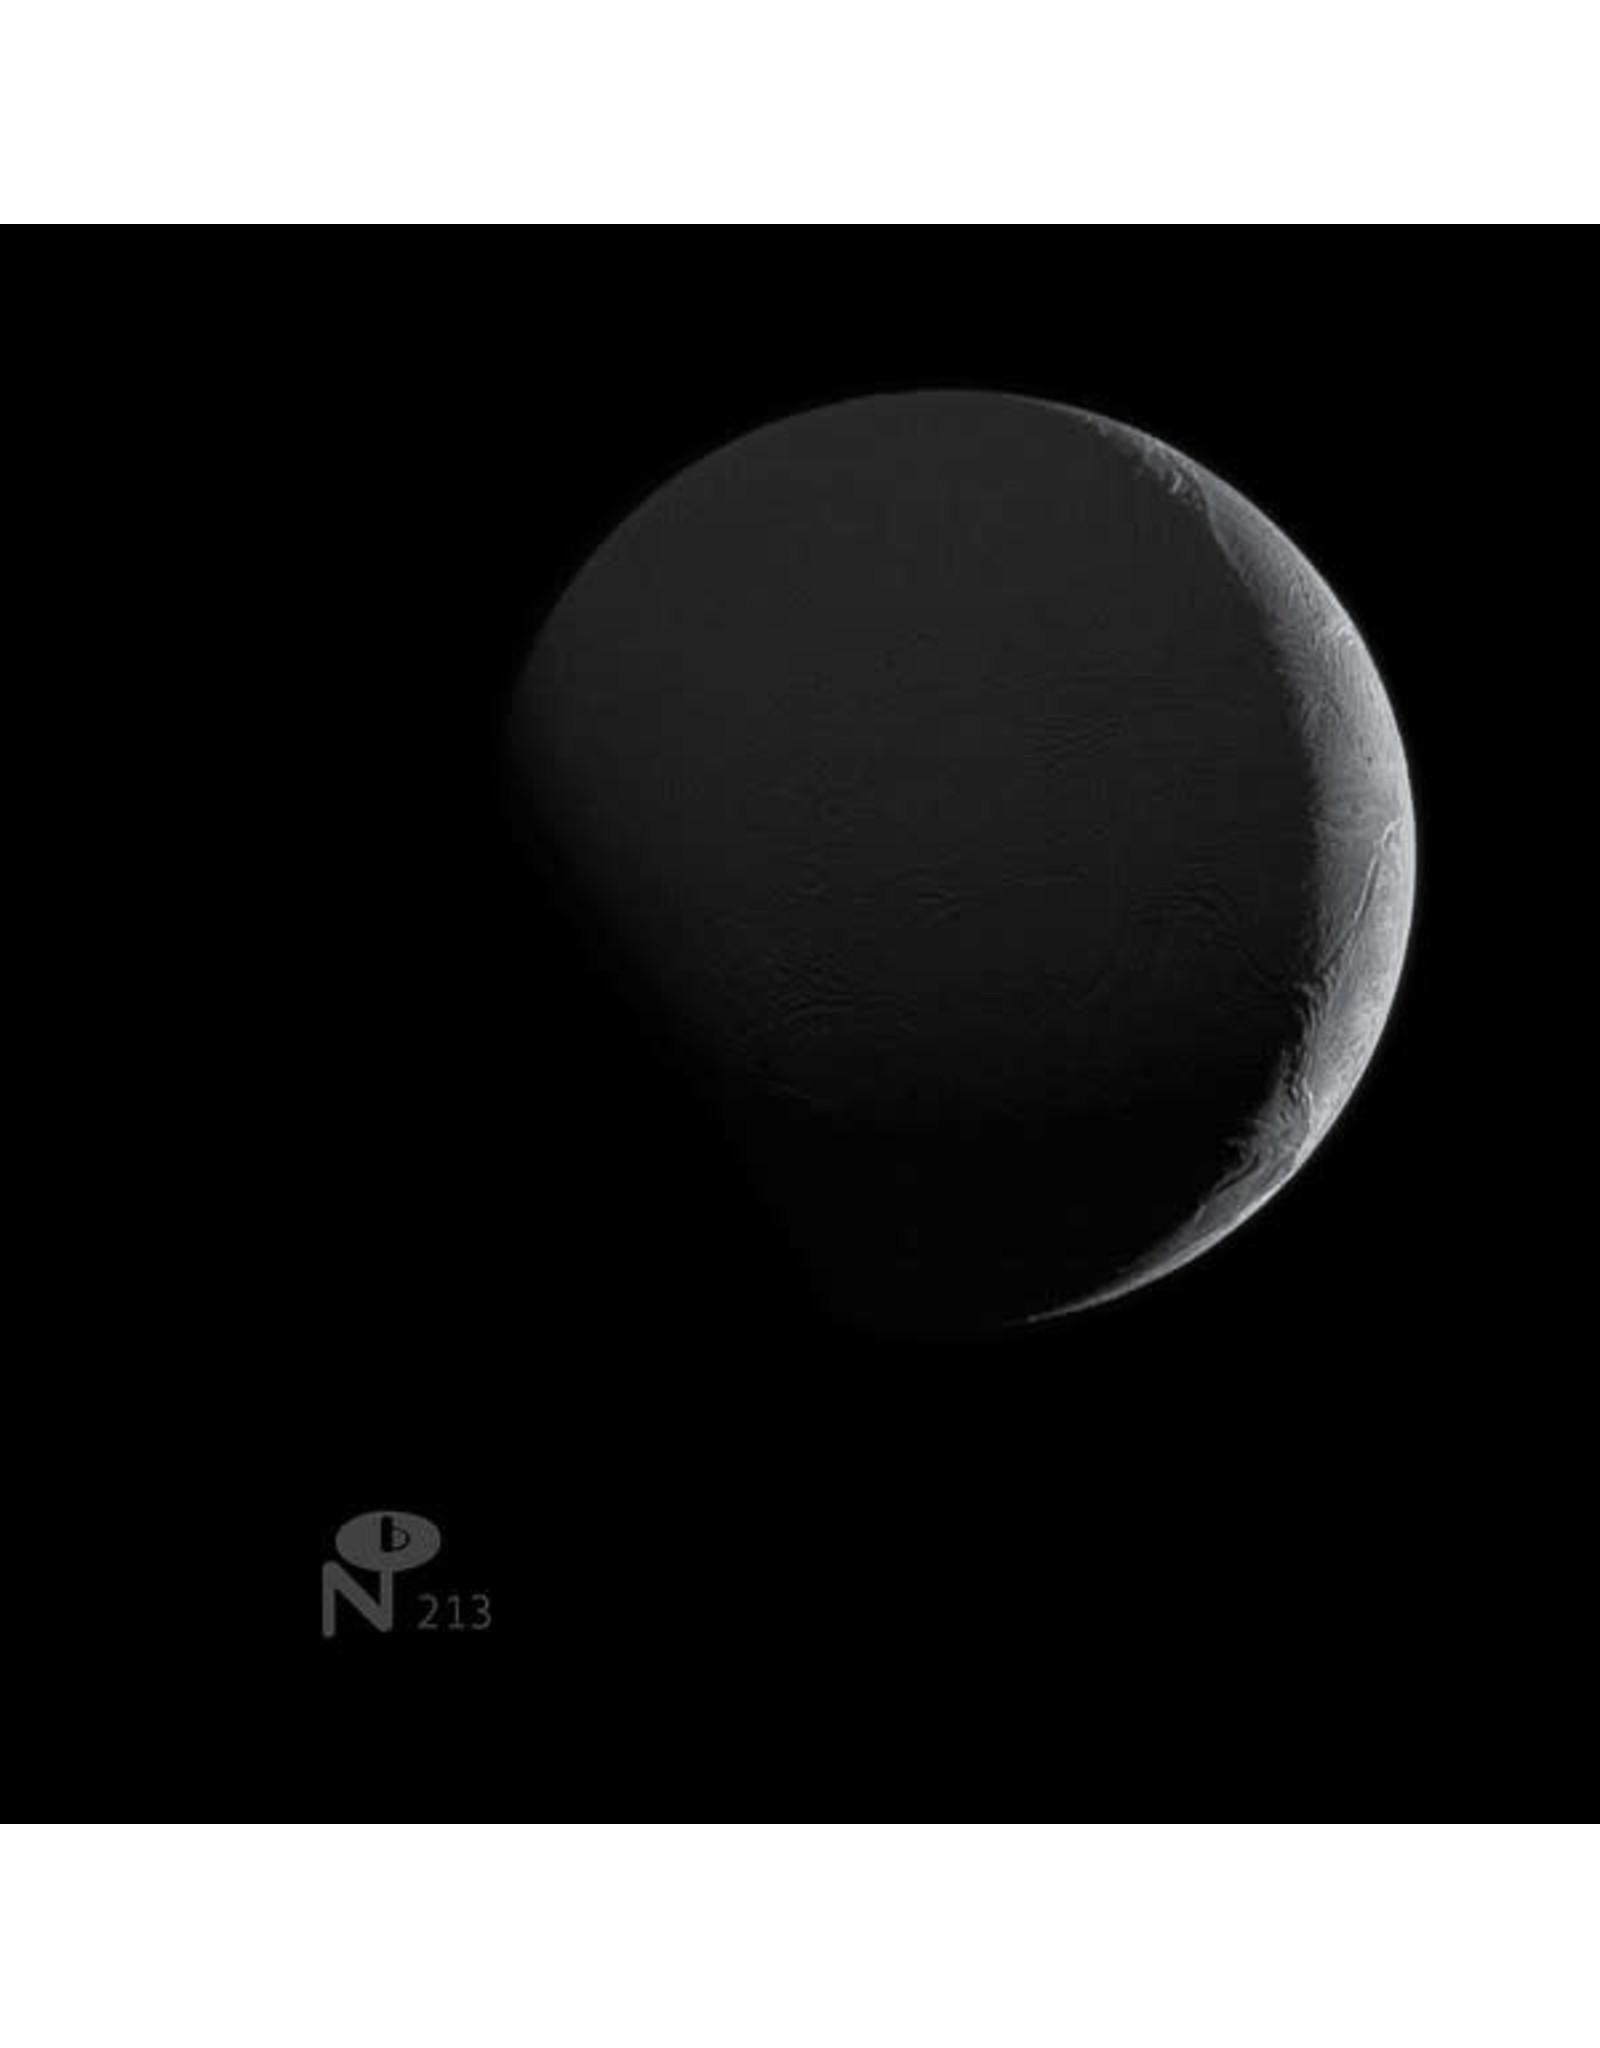 New Vinyl Valium Aggelein - Black Moon 2LP